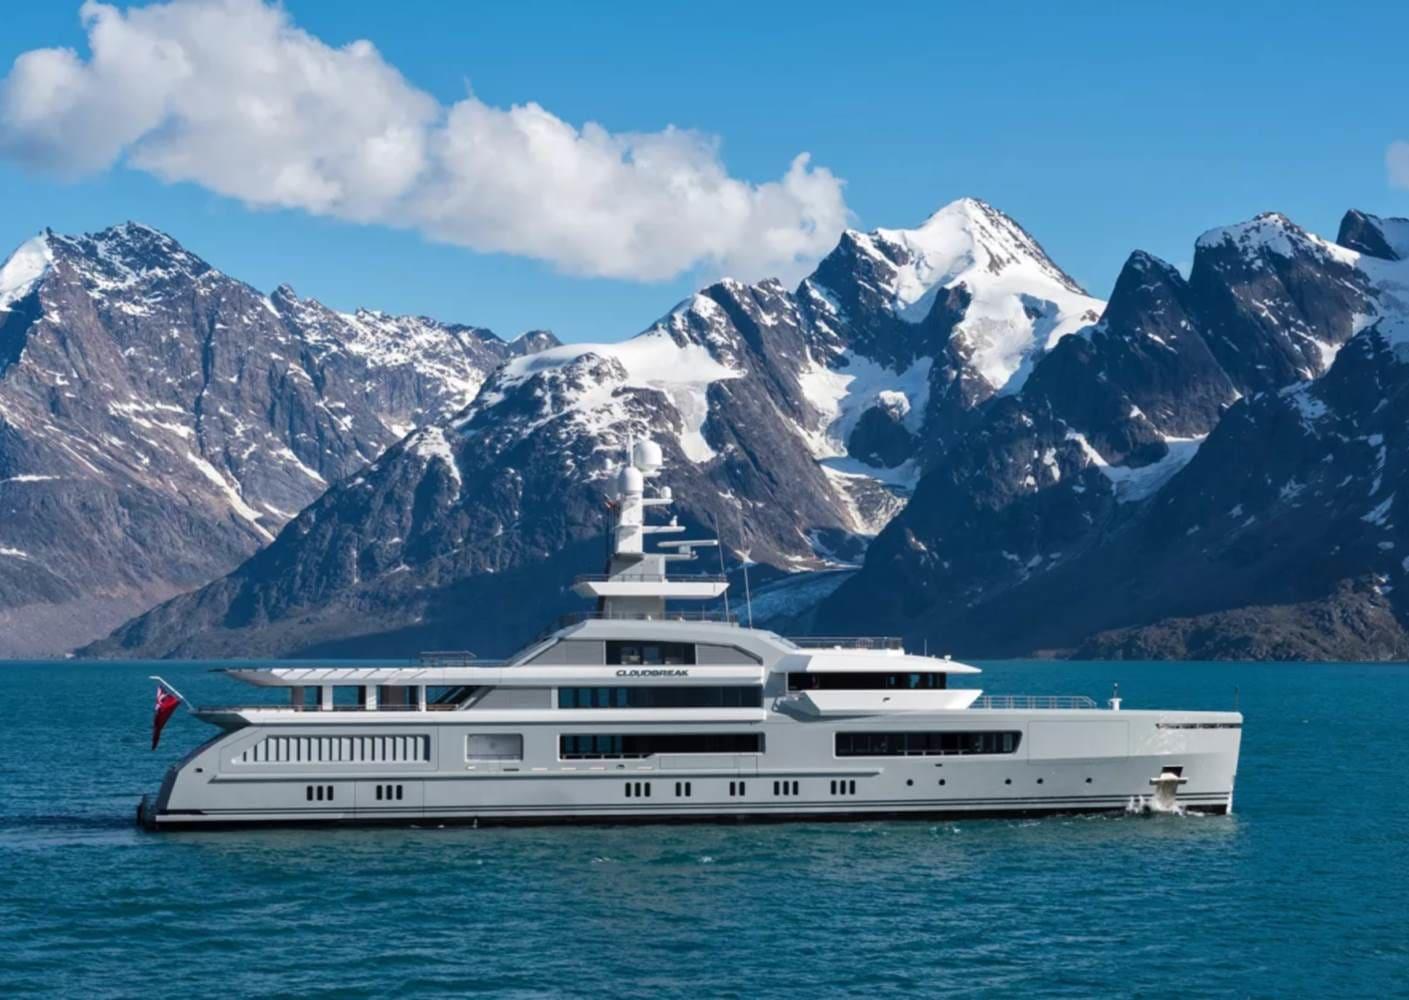 Image of Cloudbreak 75.3M (247.0FT) motor yacht